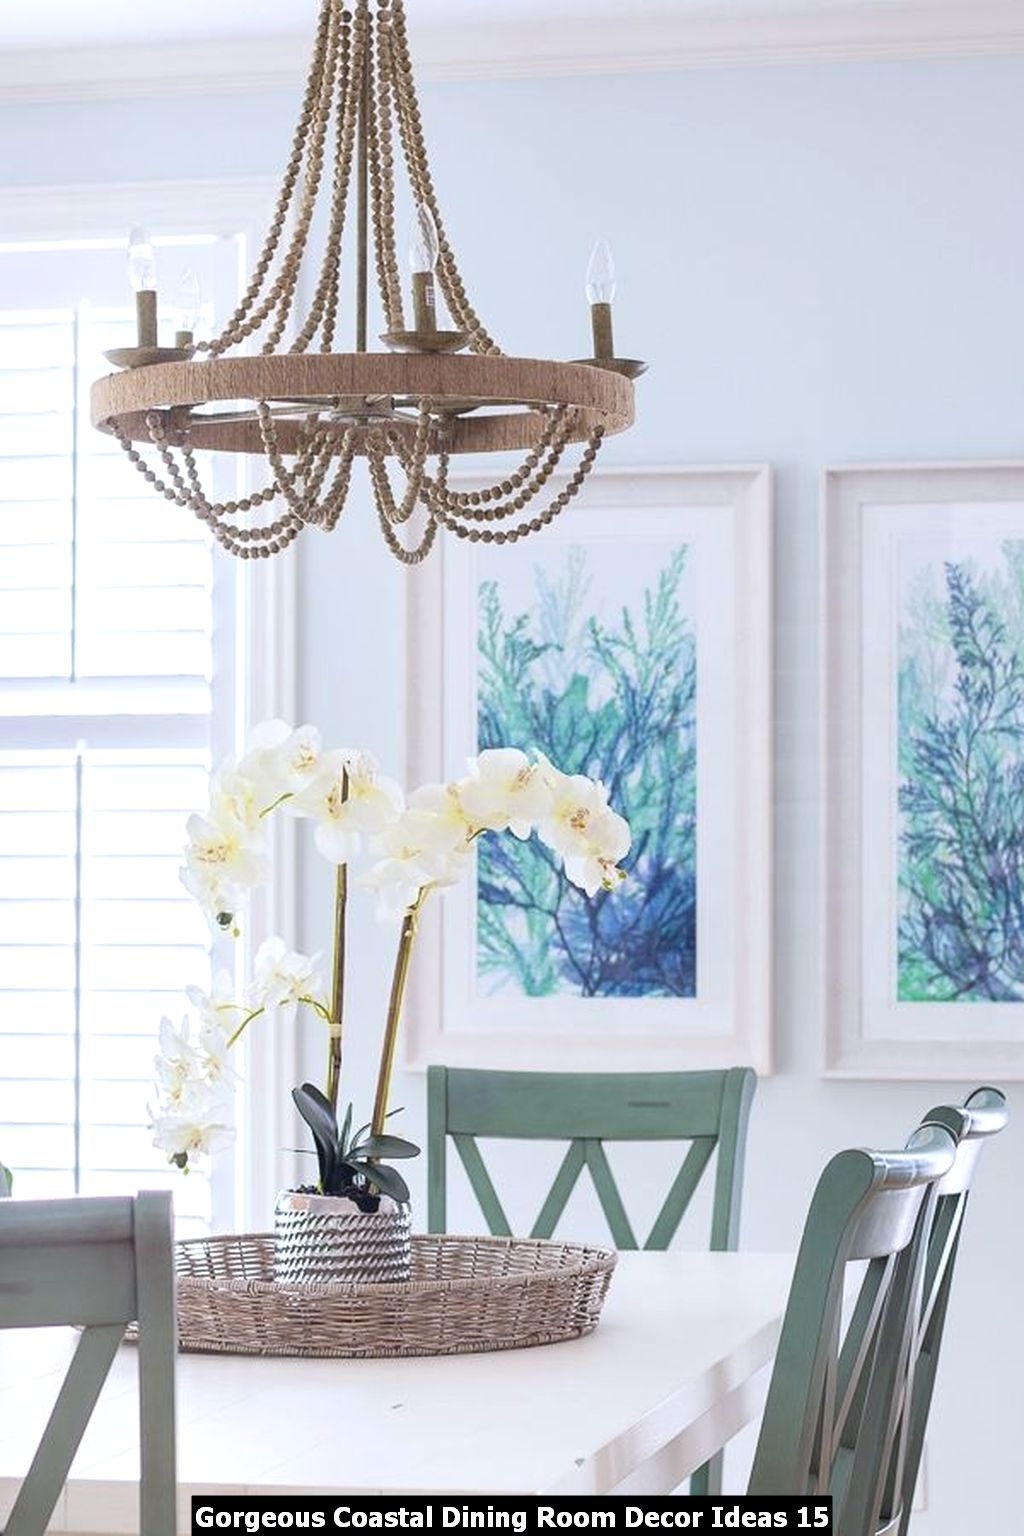 Gorgeous Coastal Dining Room Decor Ideas 15